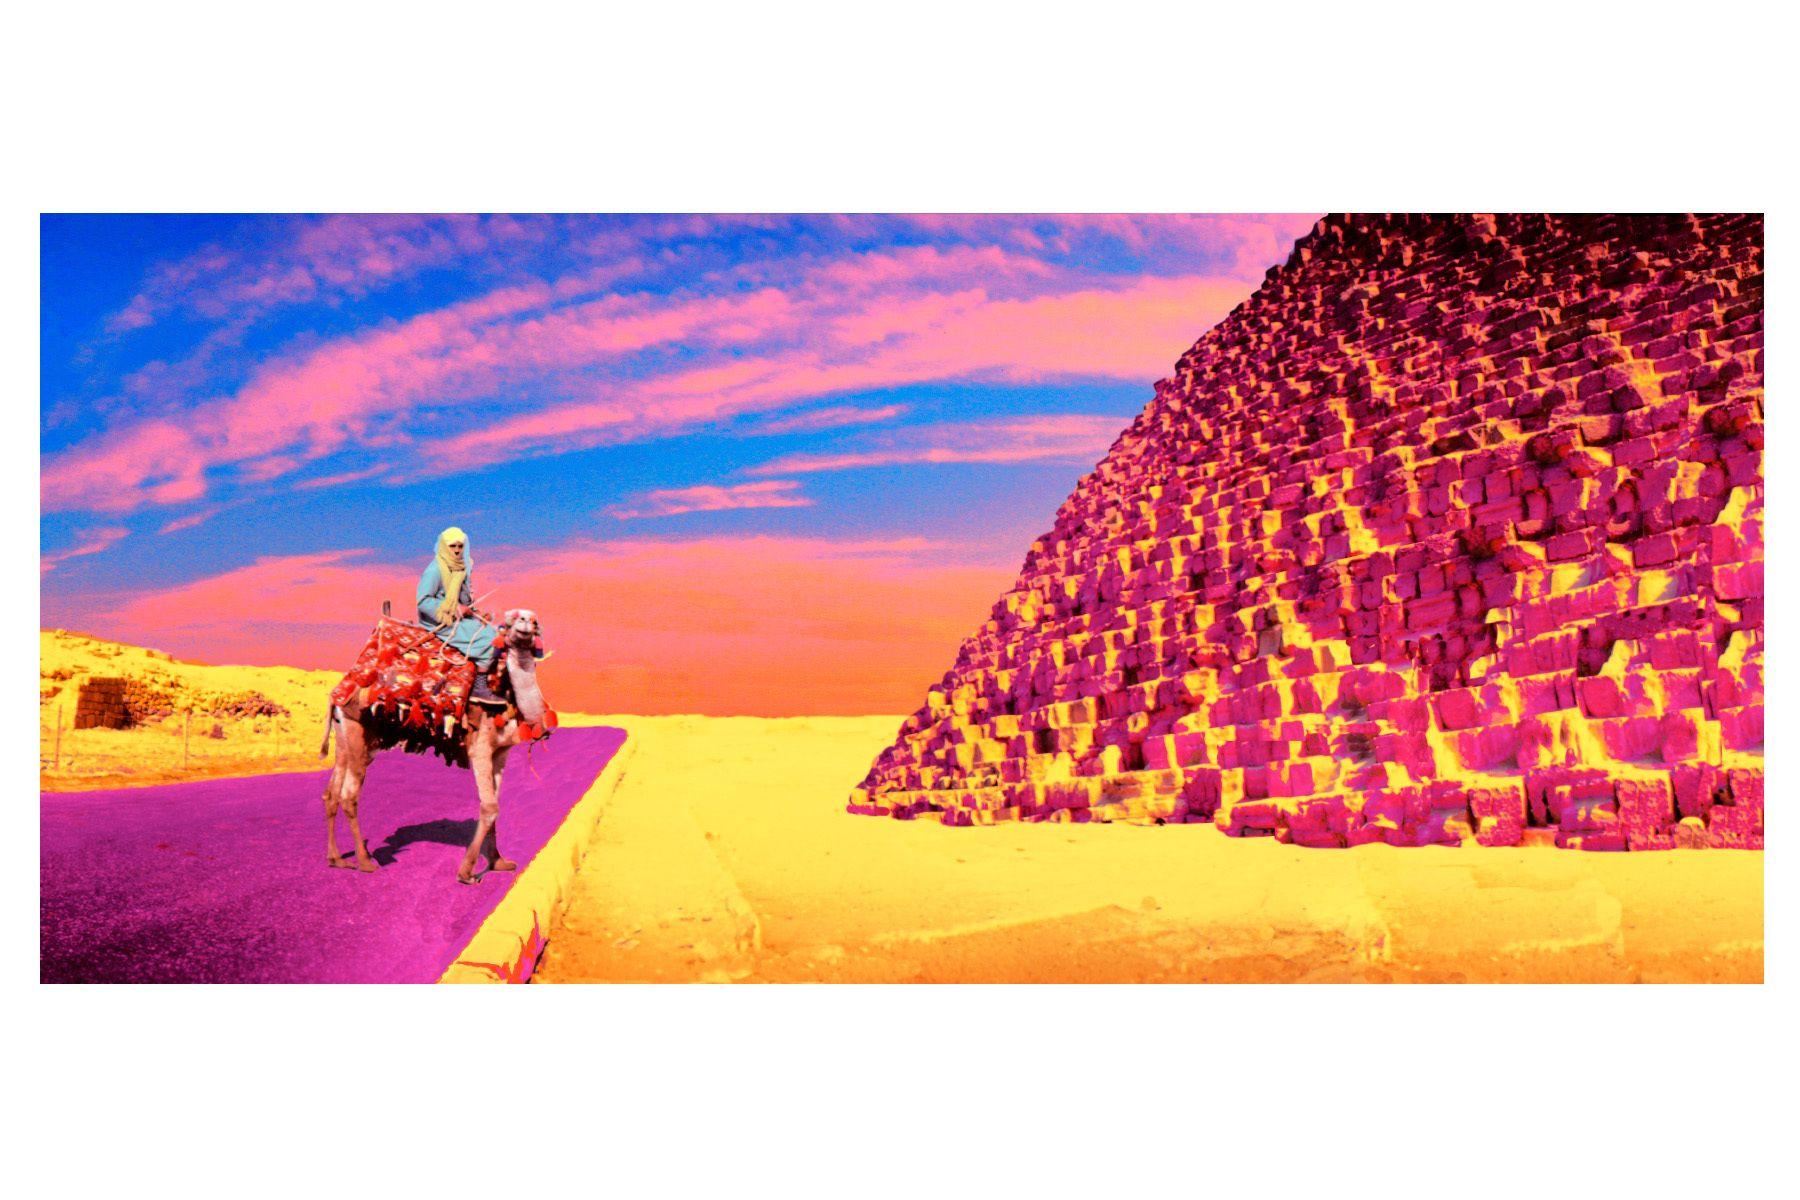 18_0_189_1p_gottlieb_egypt.jpg